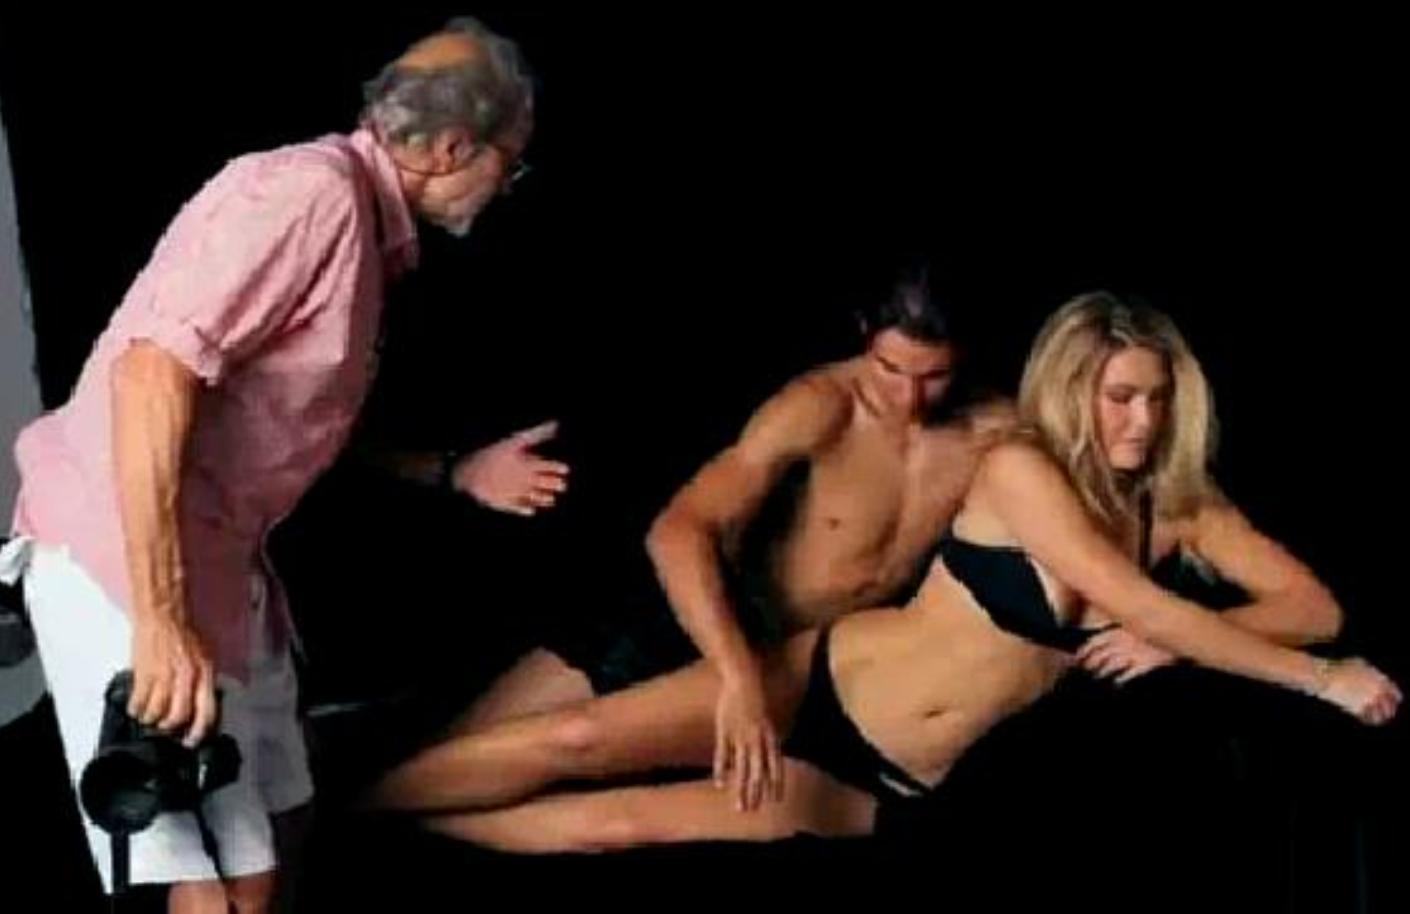 Bar and Rafa sexual position